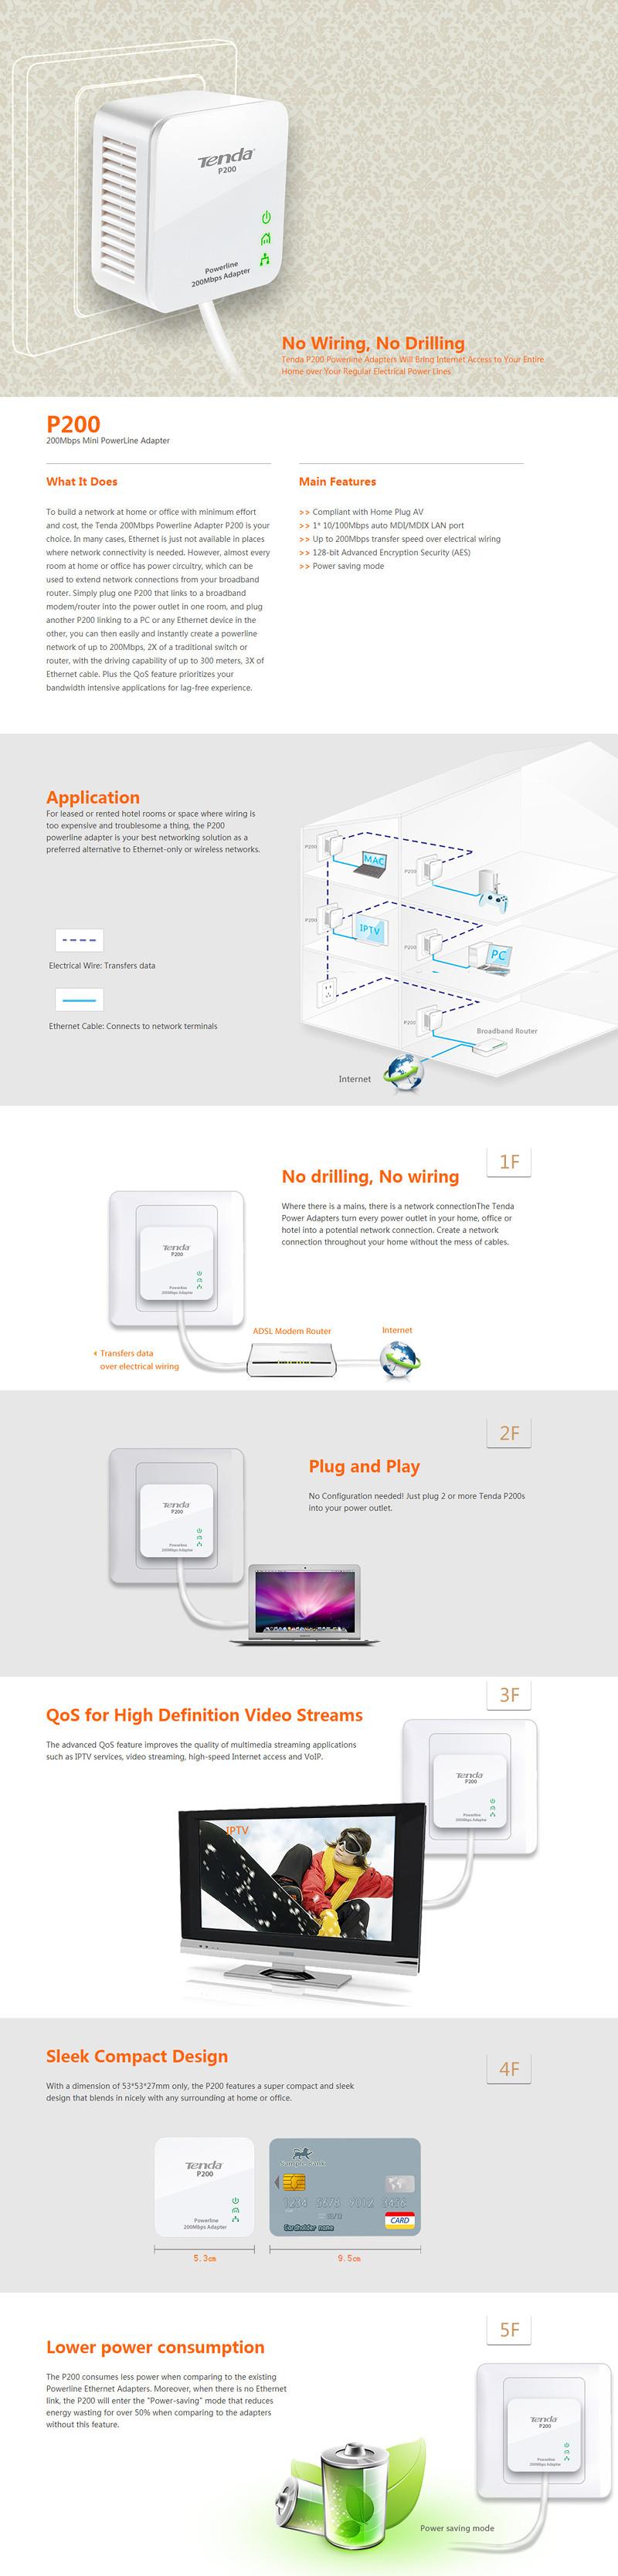 Tenda P200 Kit Powerline Adapteri Tkla Produkti Ar Vadiem Wiring Diagram Preces Apraksts Angu Valod